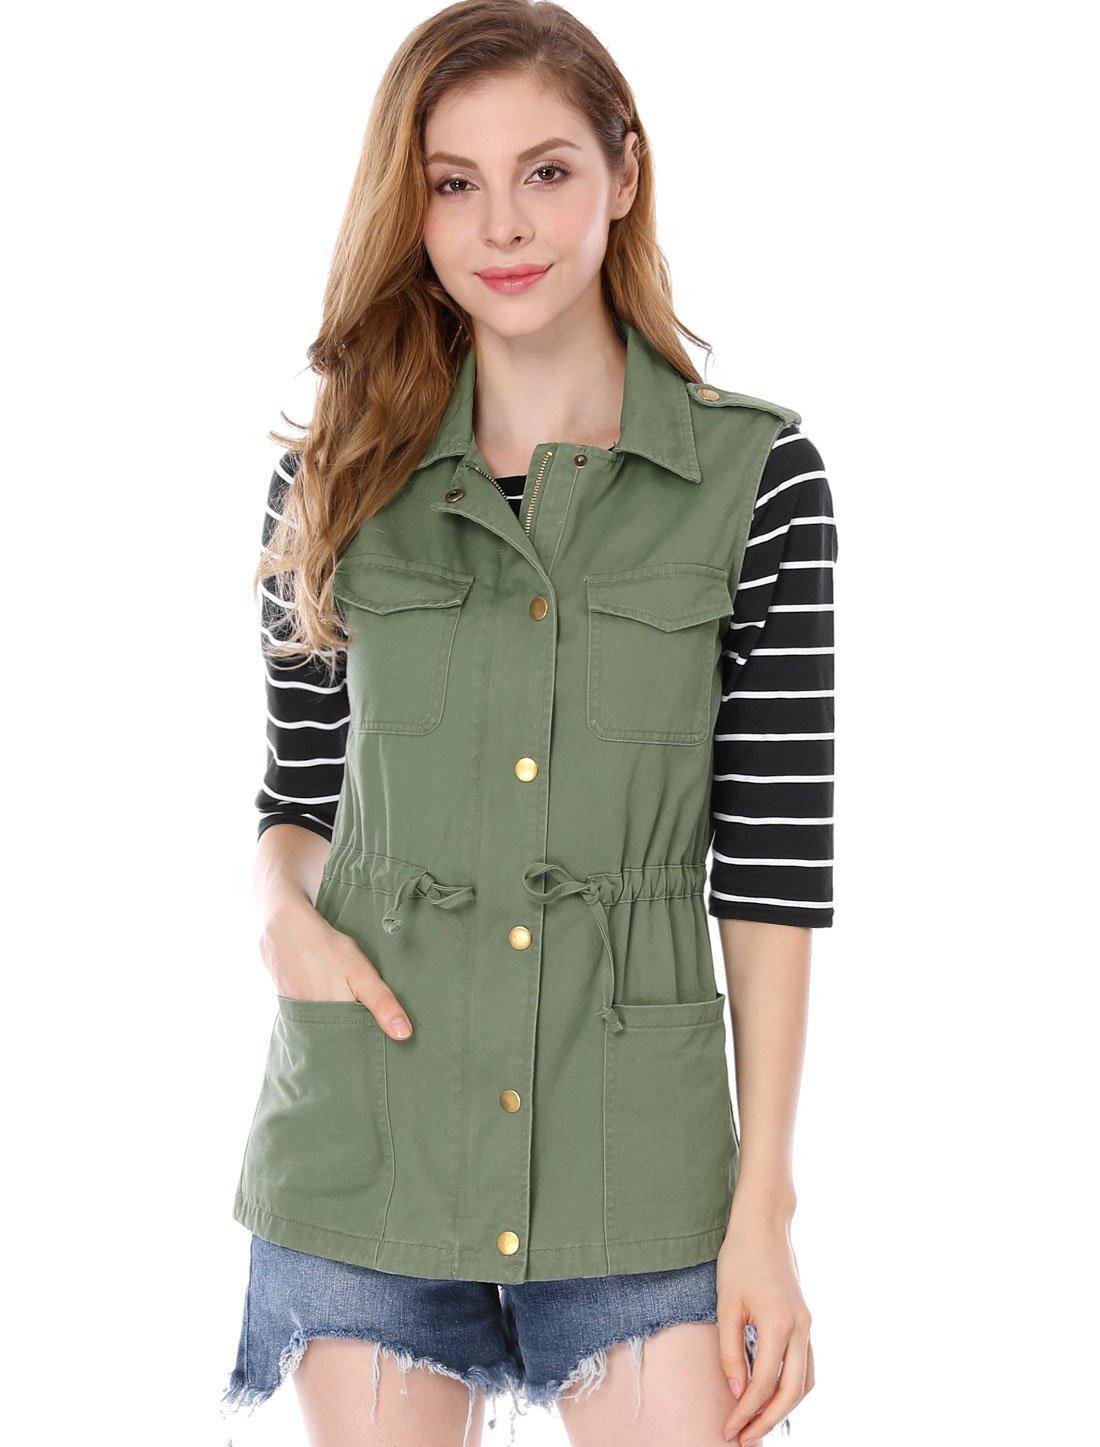 Allegra K Women's Functional Pockets Drawstring Waist Cargo Vest M Green  (US  10) by Allegra K